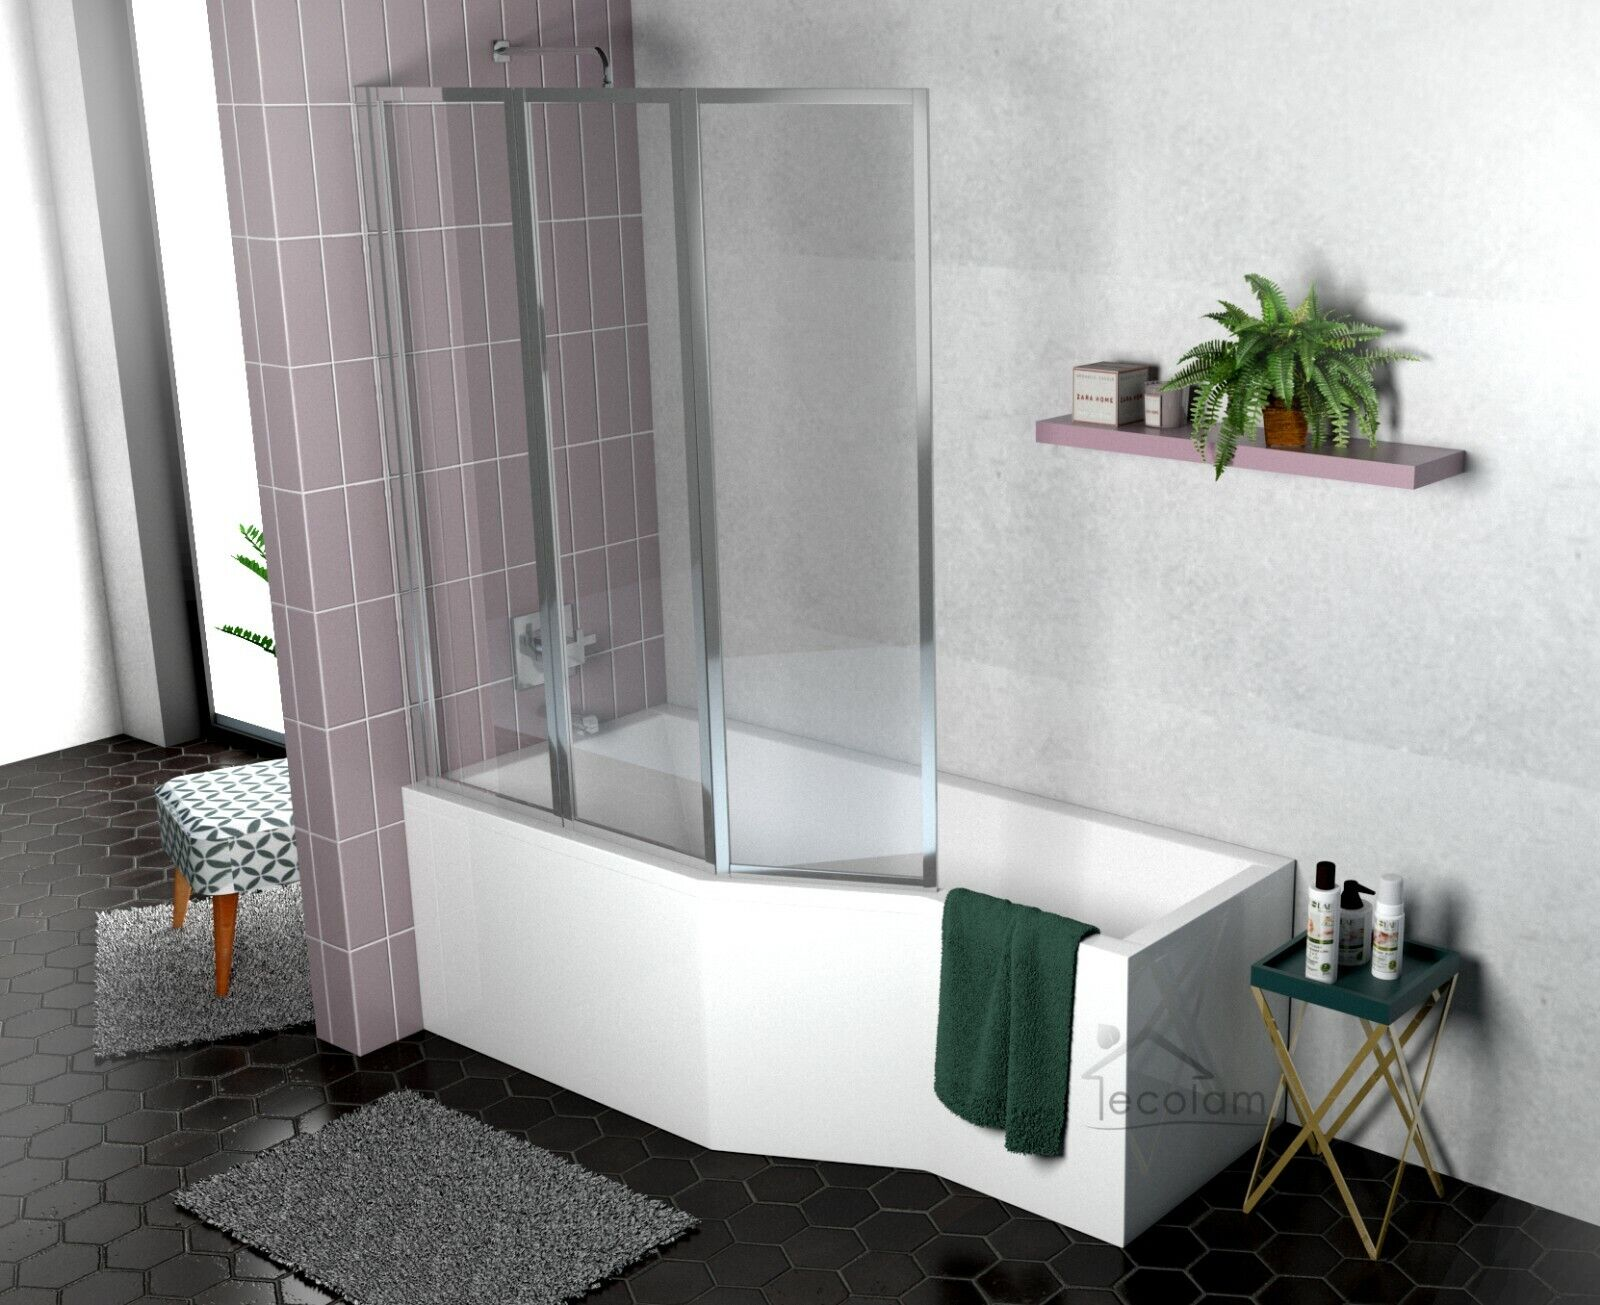 Duschbadewanne Badewanne Glasabtrennung Duschwand Faltwand 150x75 170x75 links